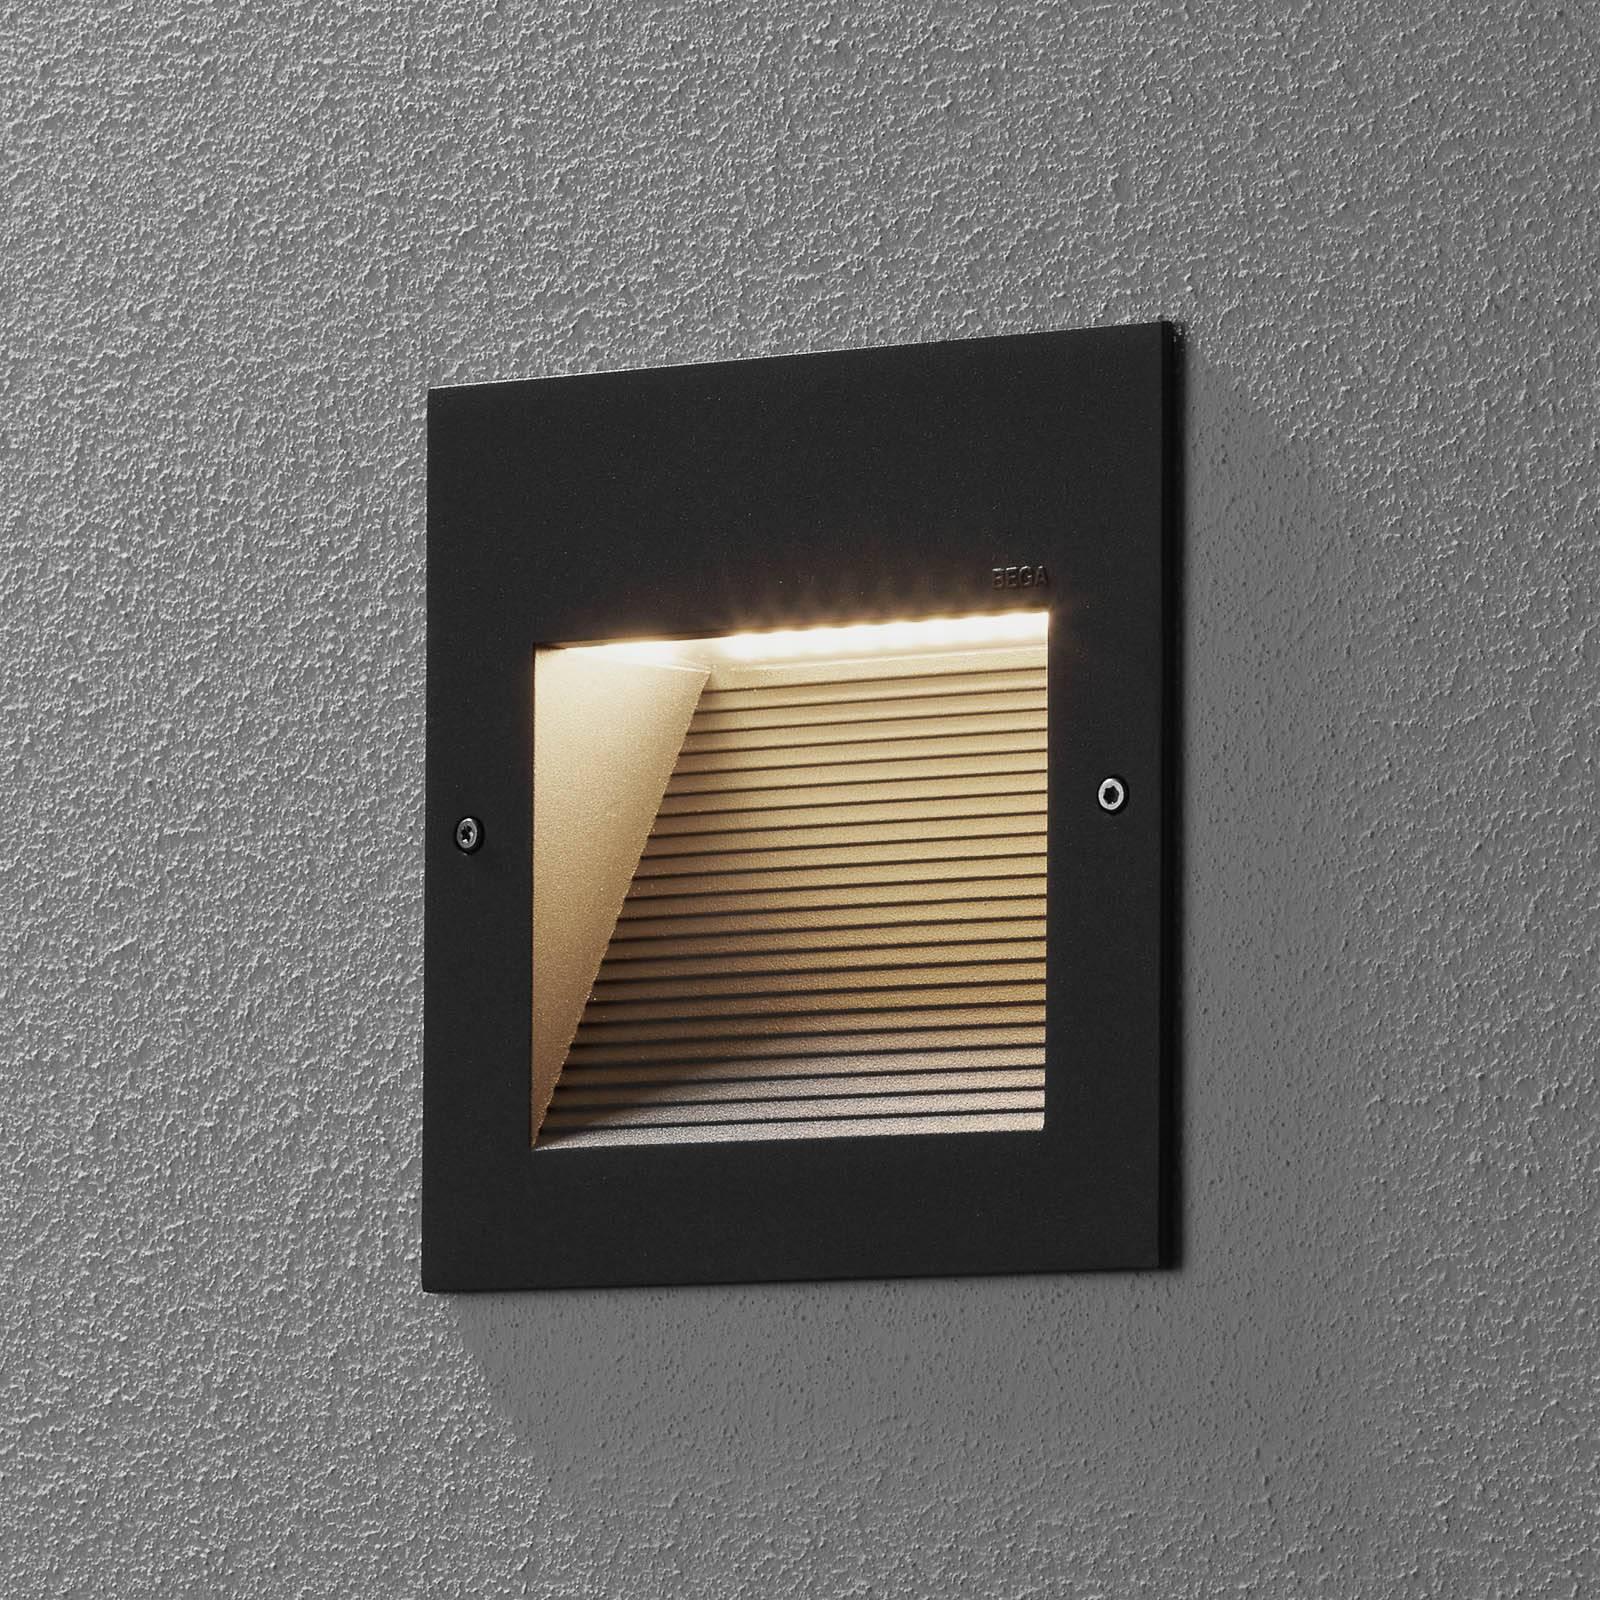 BEGA 24202 applique encastrée LED 3000K, graphite